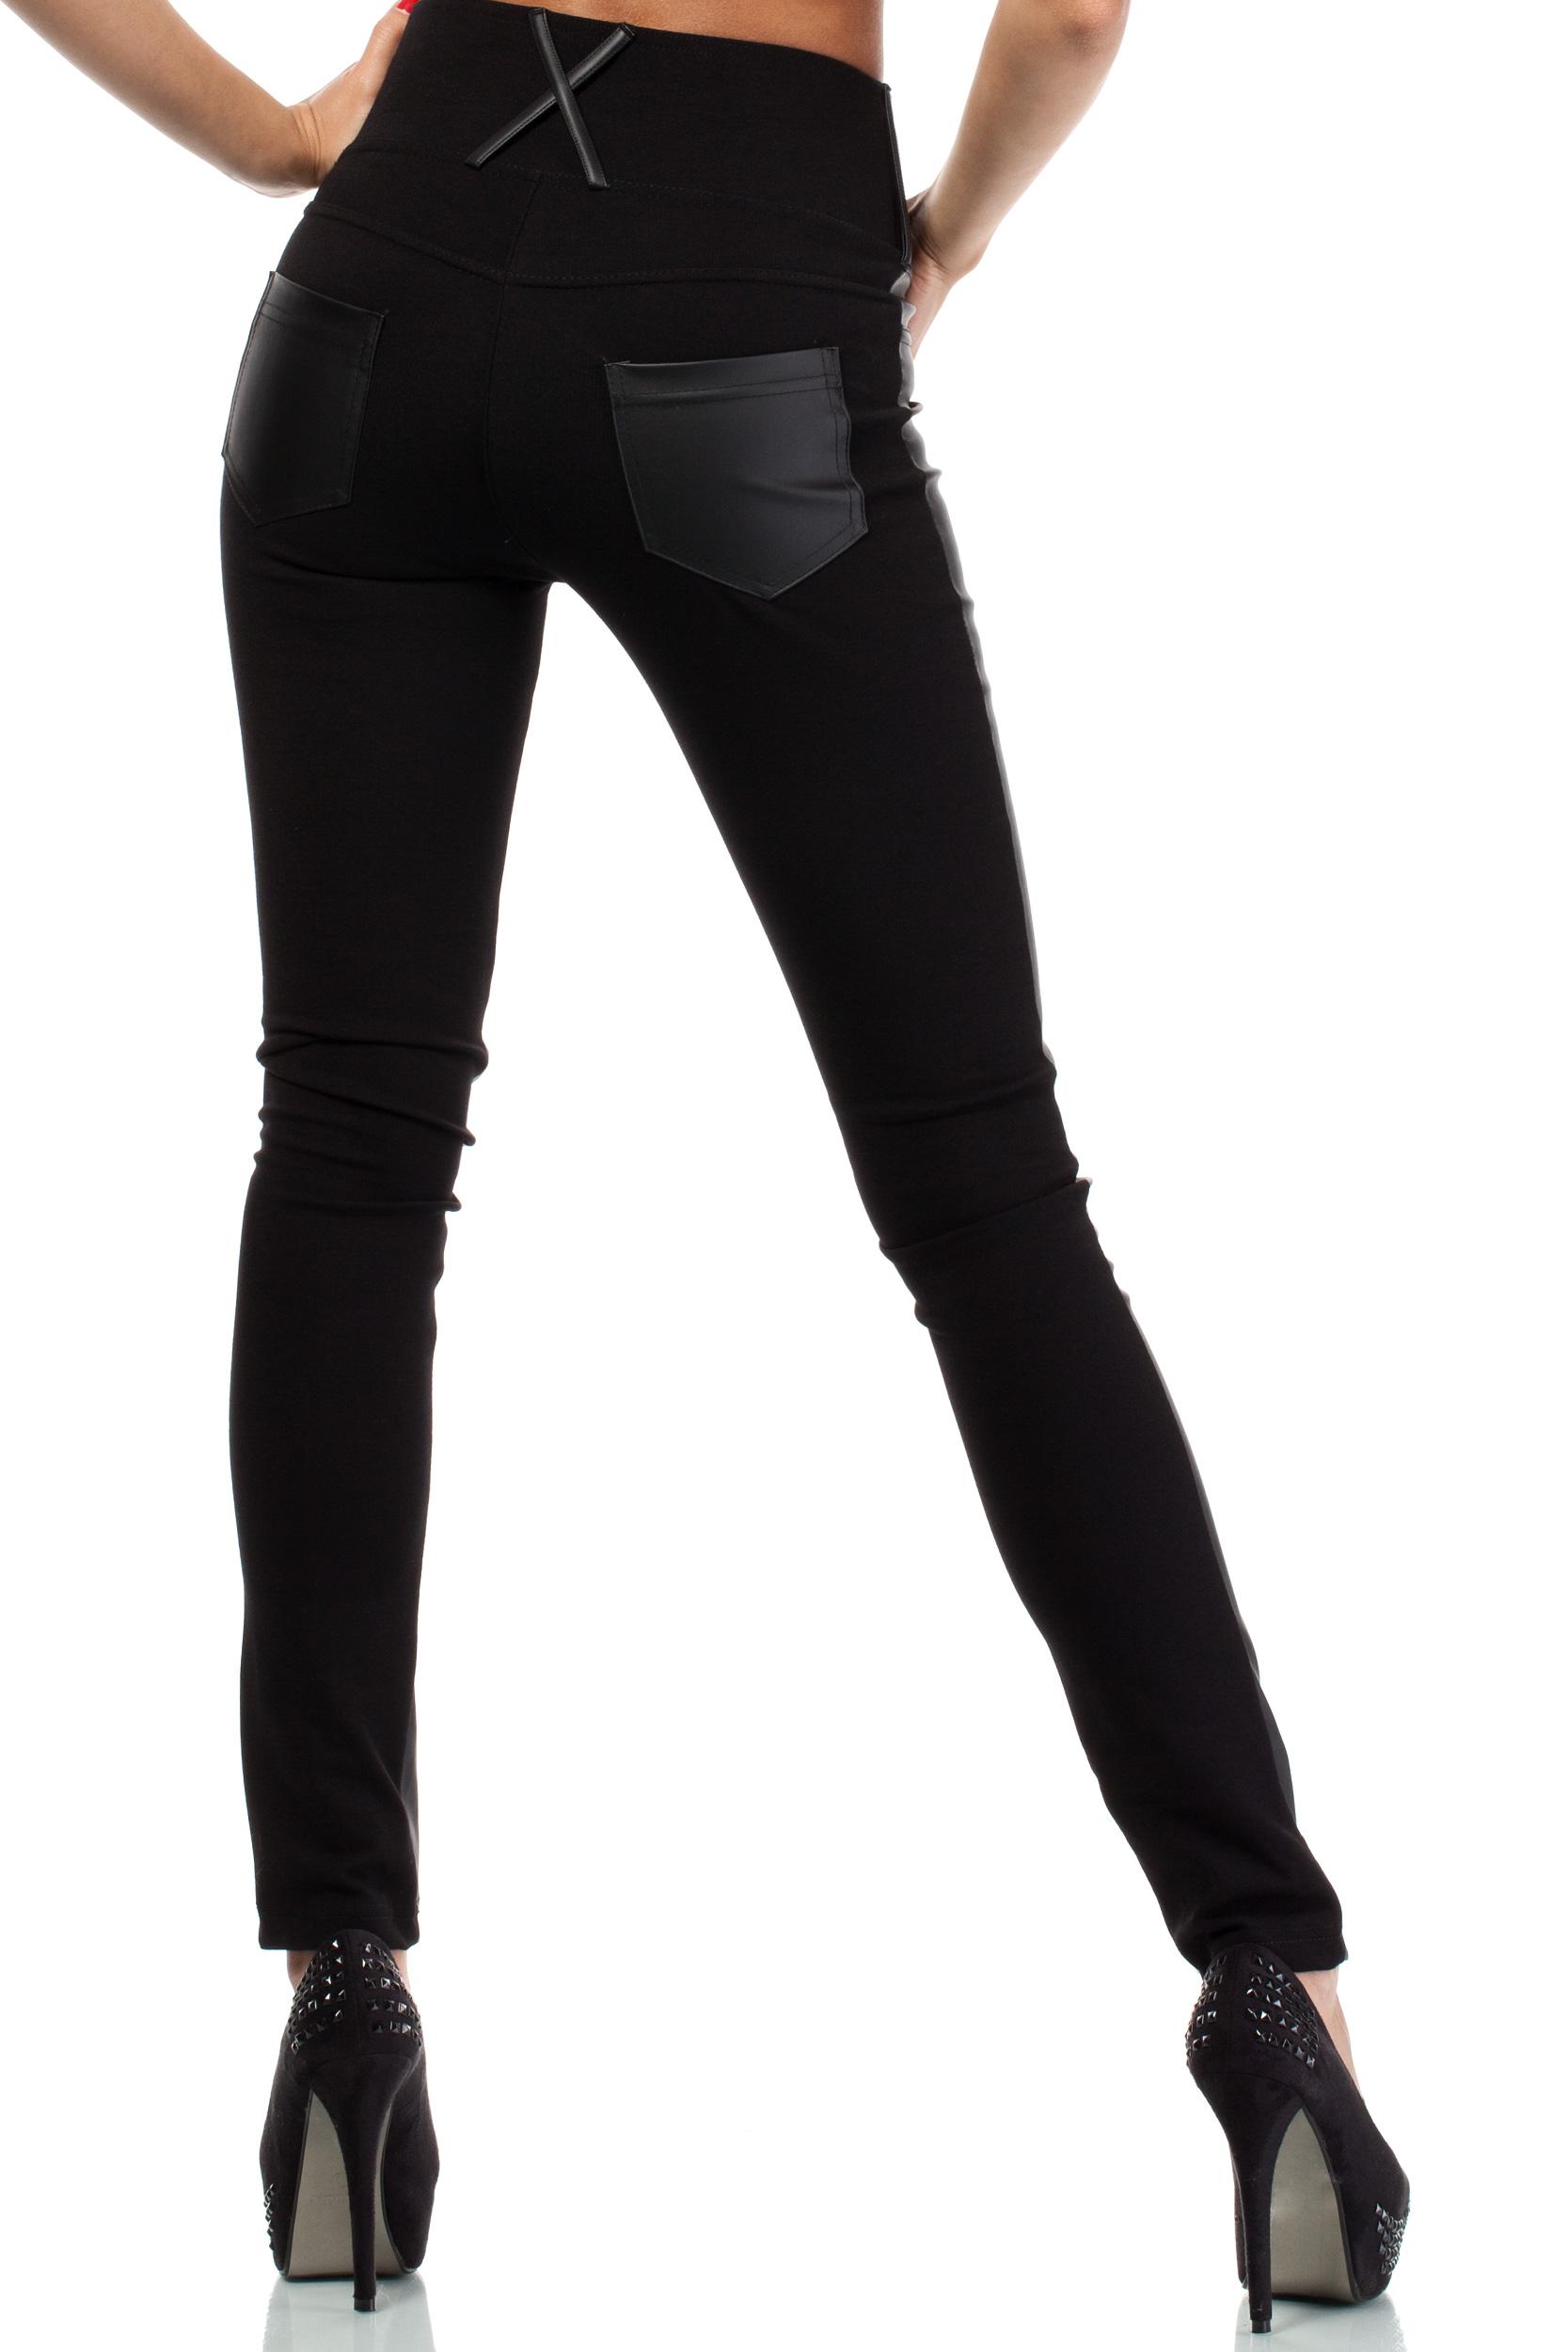 CM3945 Dopasowane skórzane legginsy z kieszeniami plus size - czarne